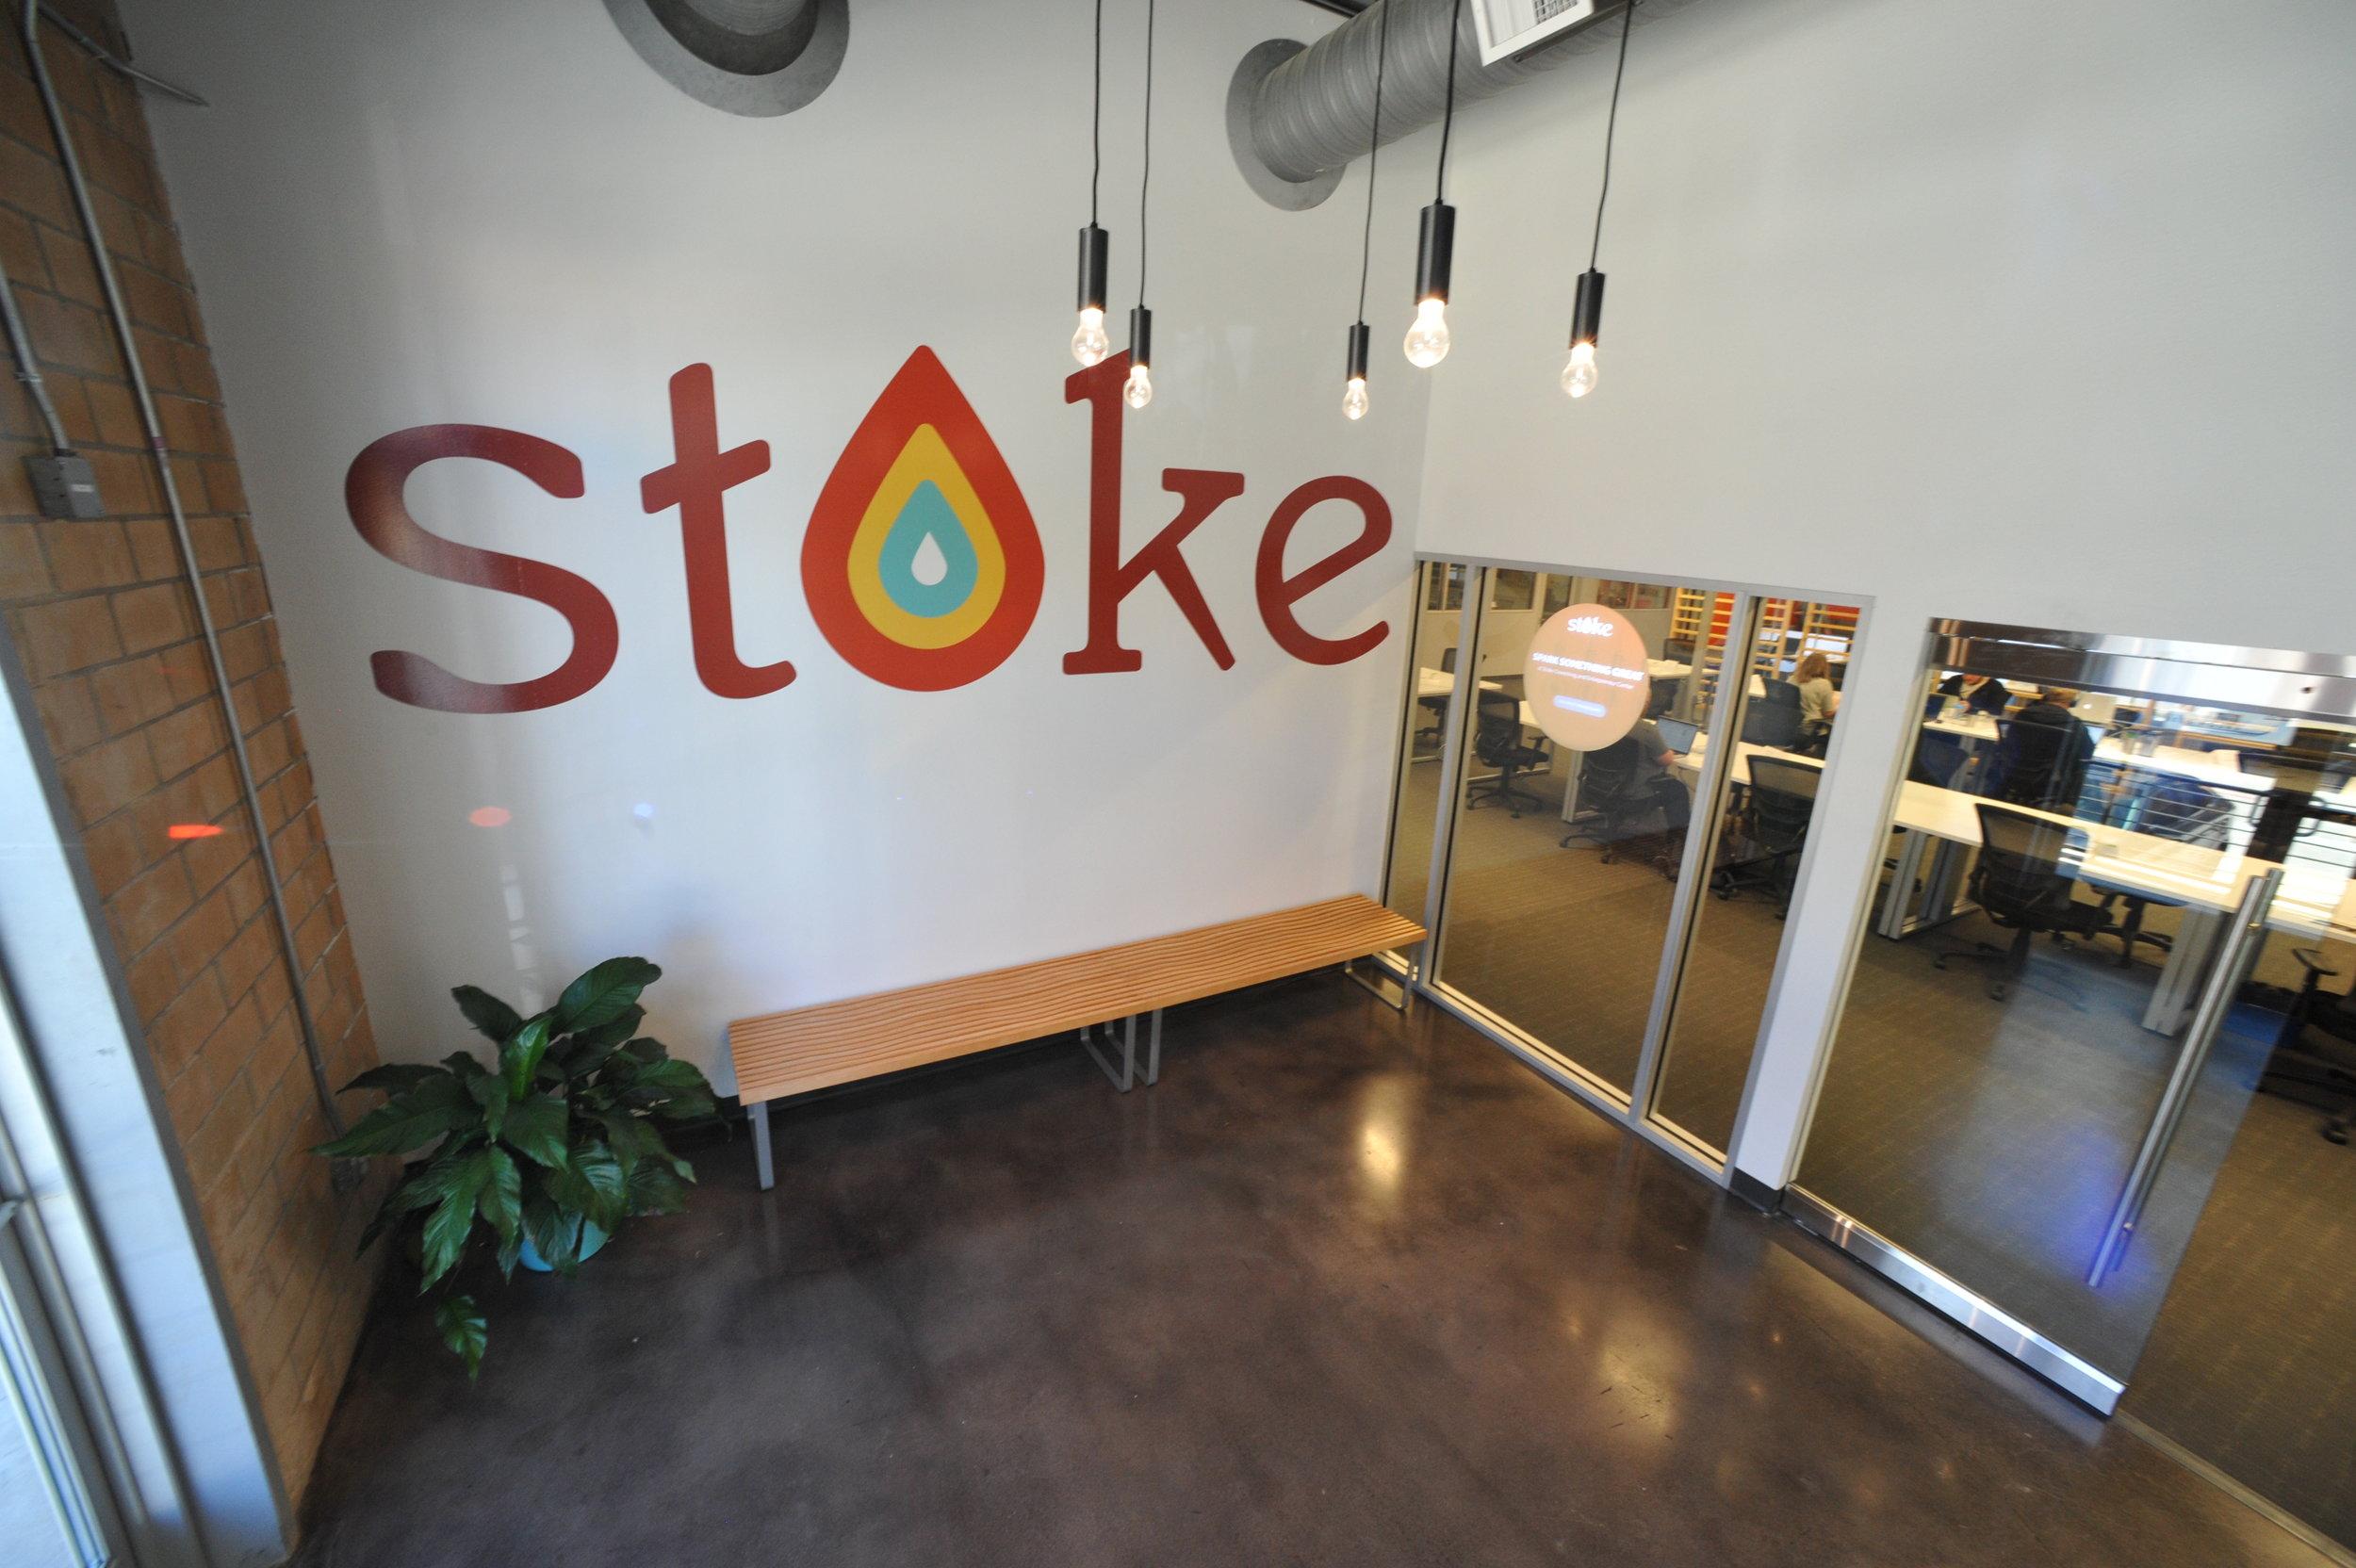 stoke-coworking-denton-texas.JPG